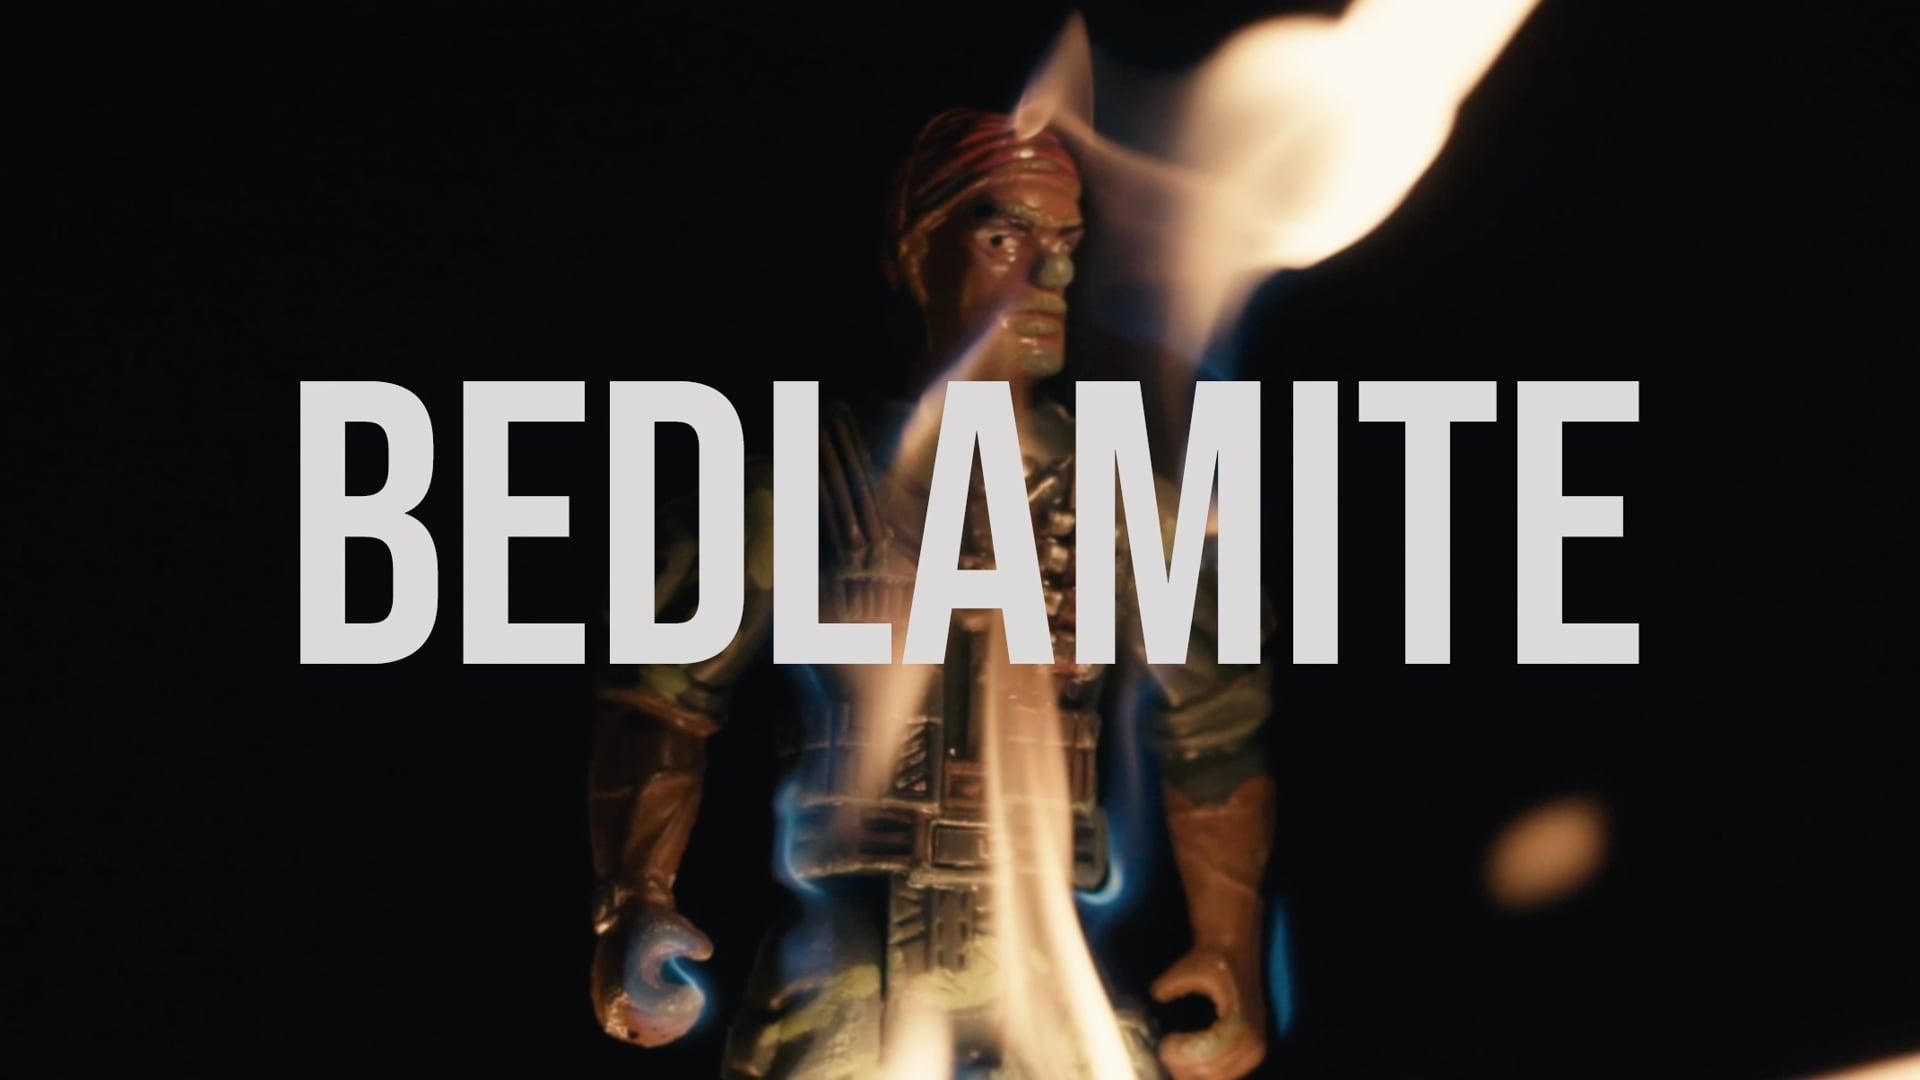 BEDLAMITE (2018)